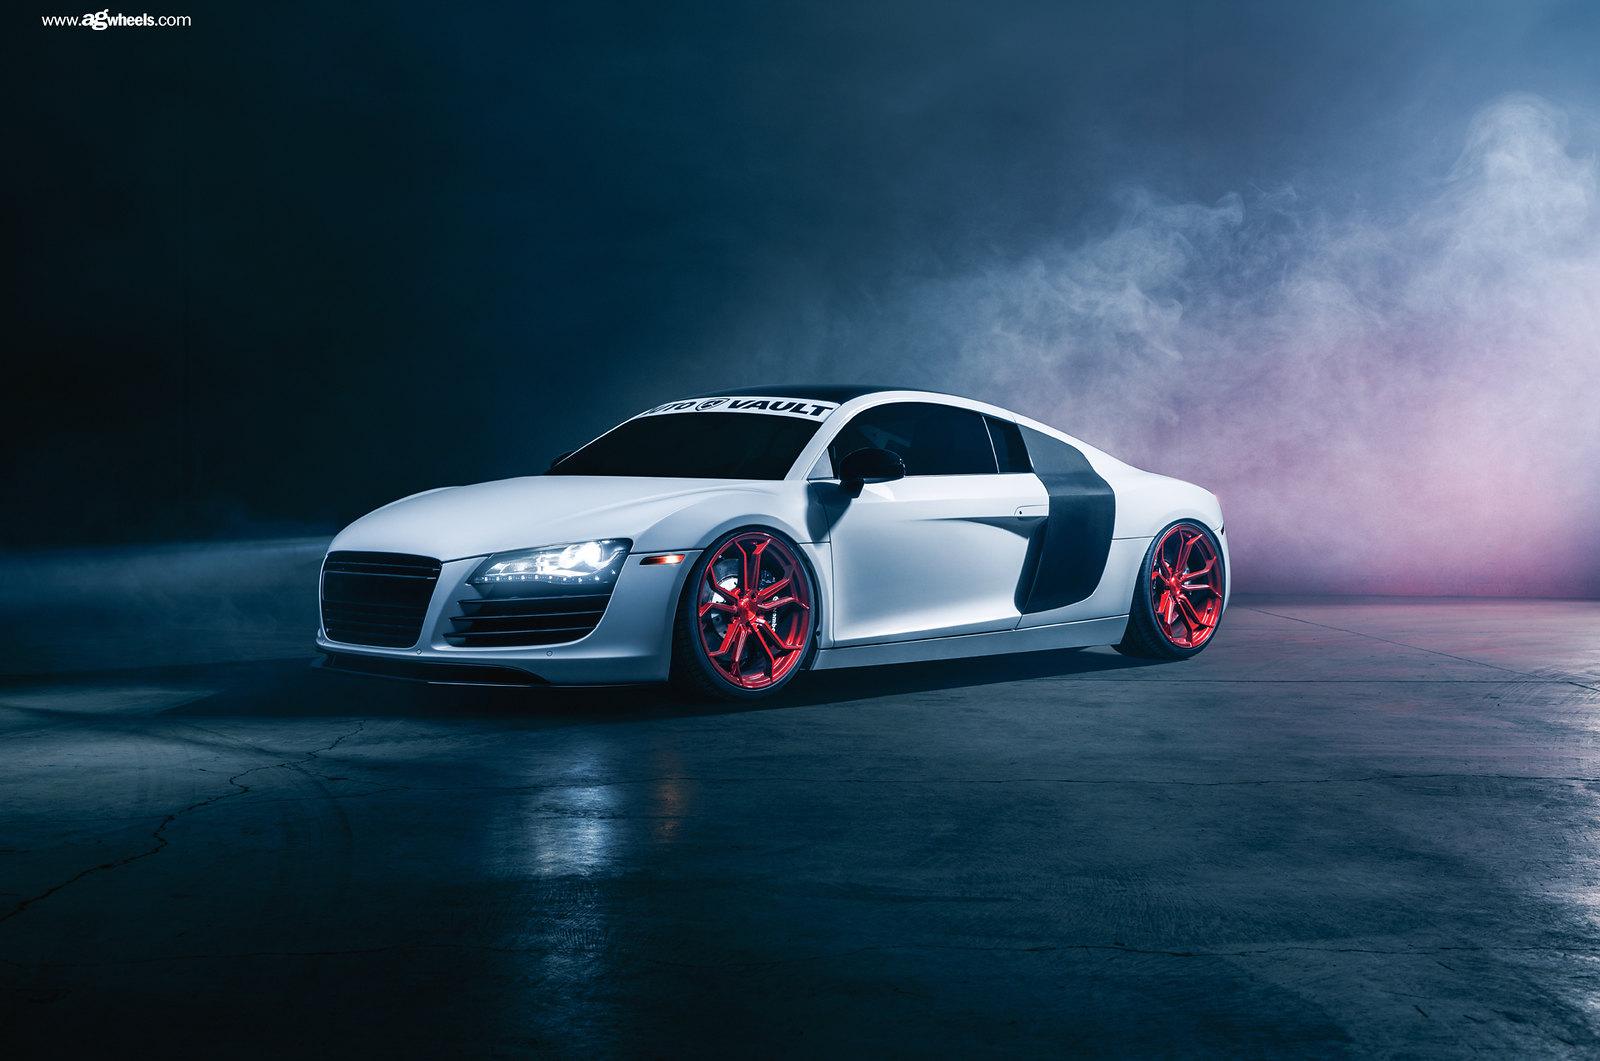 Avant Garde Audi R M DFW Auto Club Forums - Audi dfw